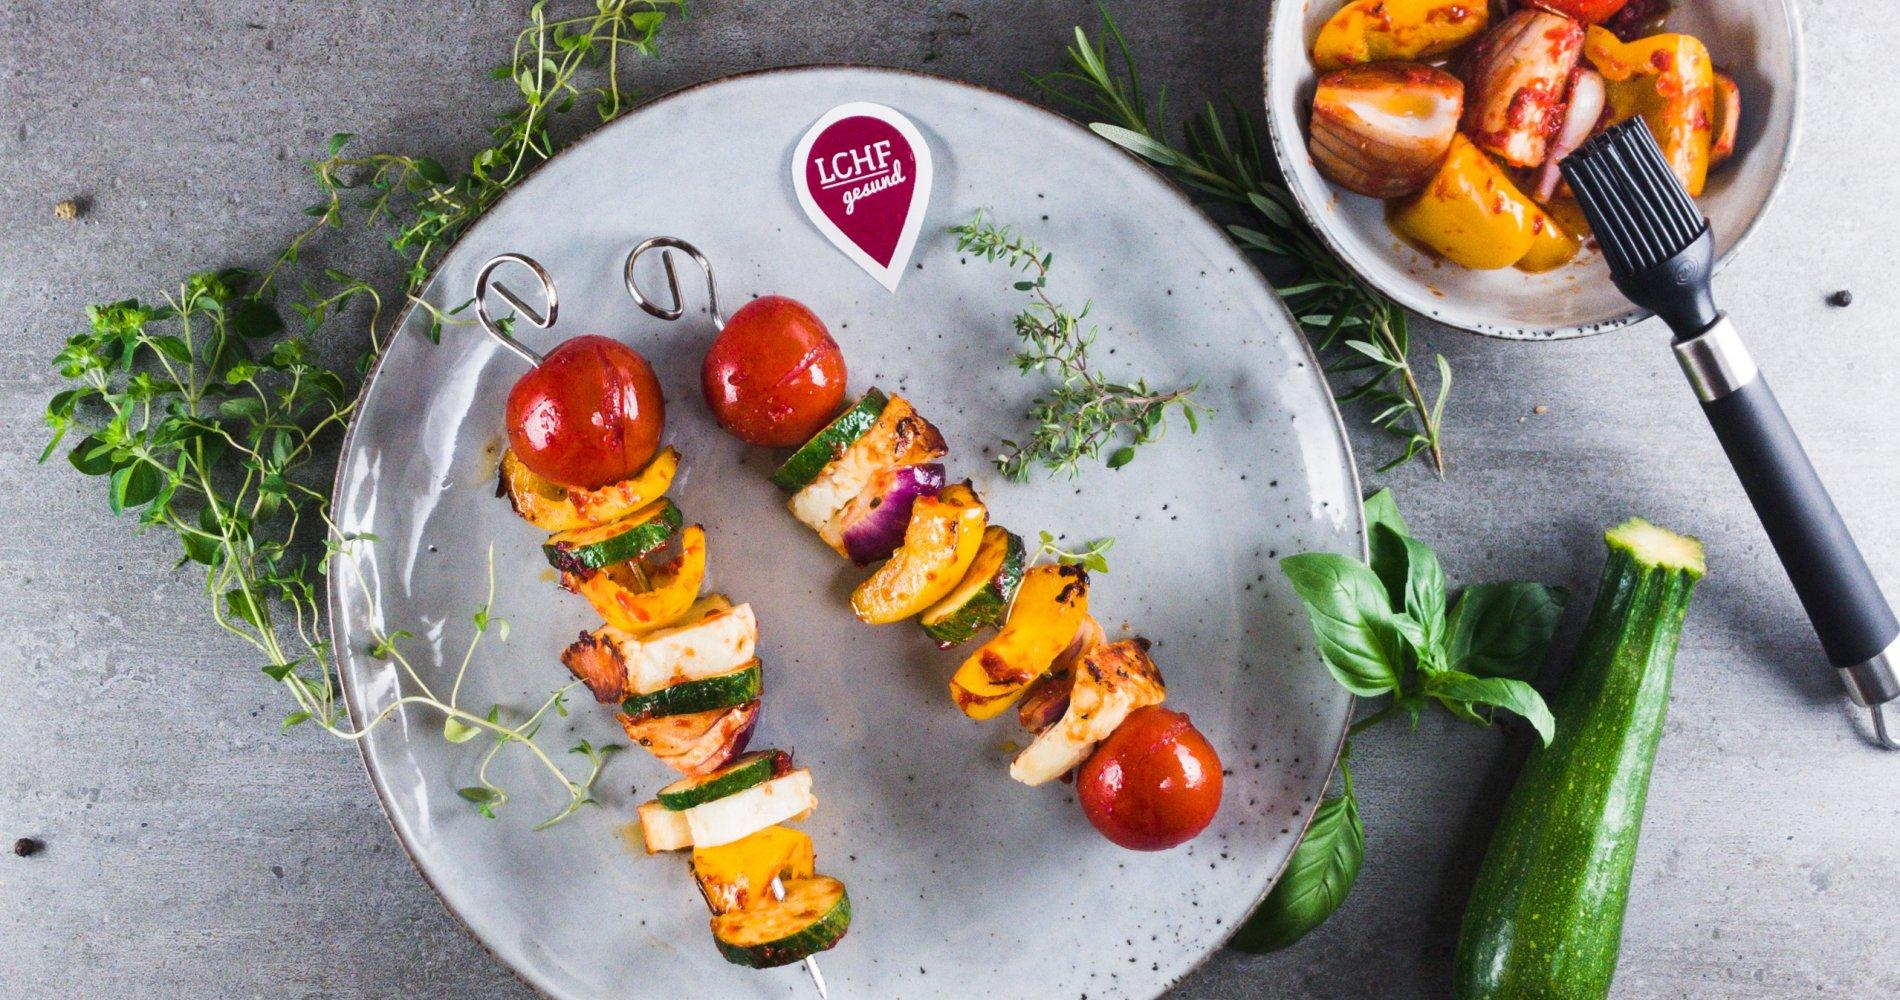 Rezept Low Carb: Bunte Gemüsespieße - LCHF-gesund.de